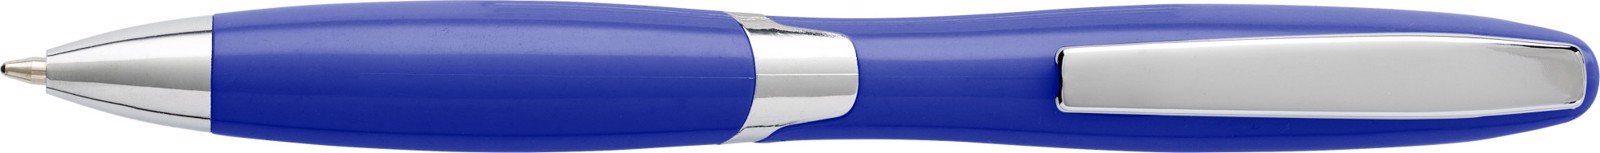 Plastic ballpen with solid colour barrel - Blue